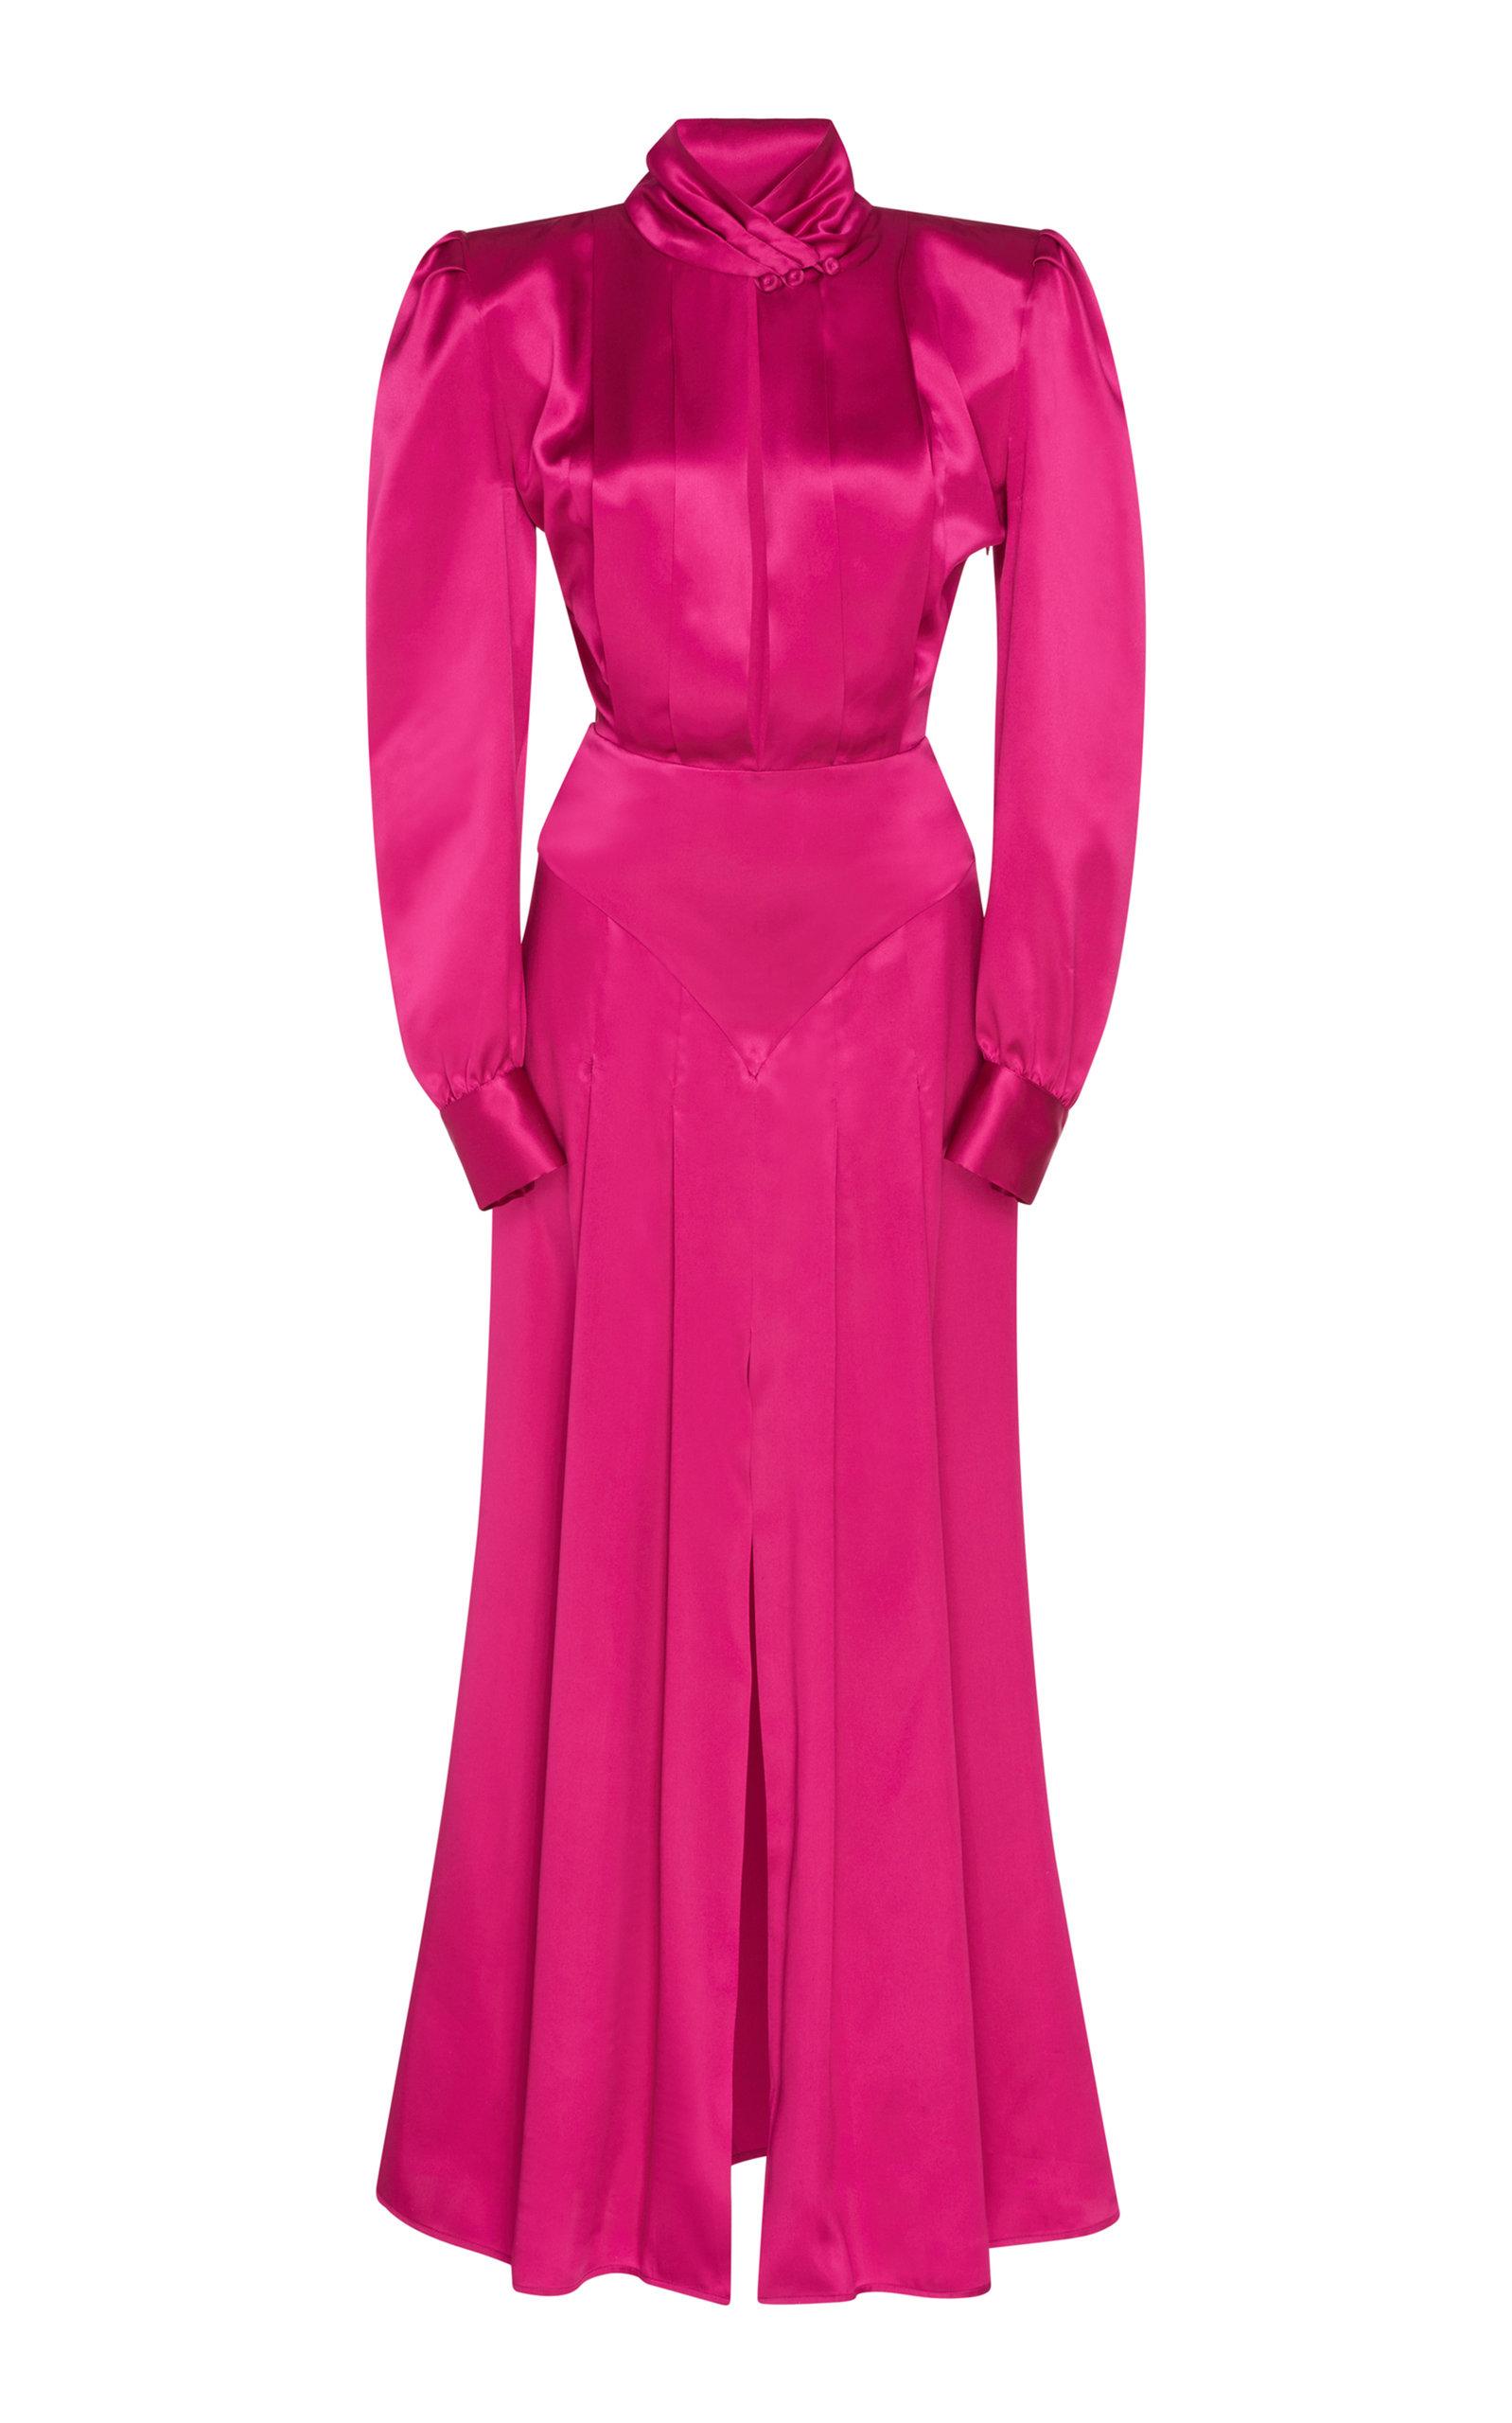 ALESSANDRA RICH Silk Satin High Neck Pleated Dress in Pink